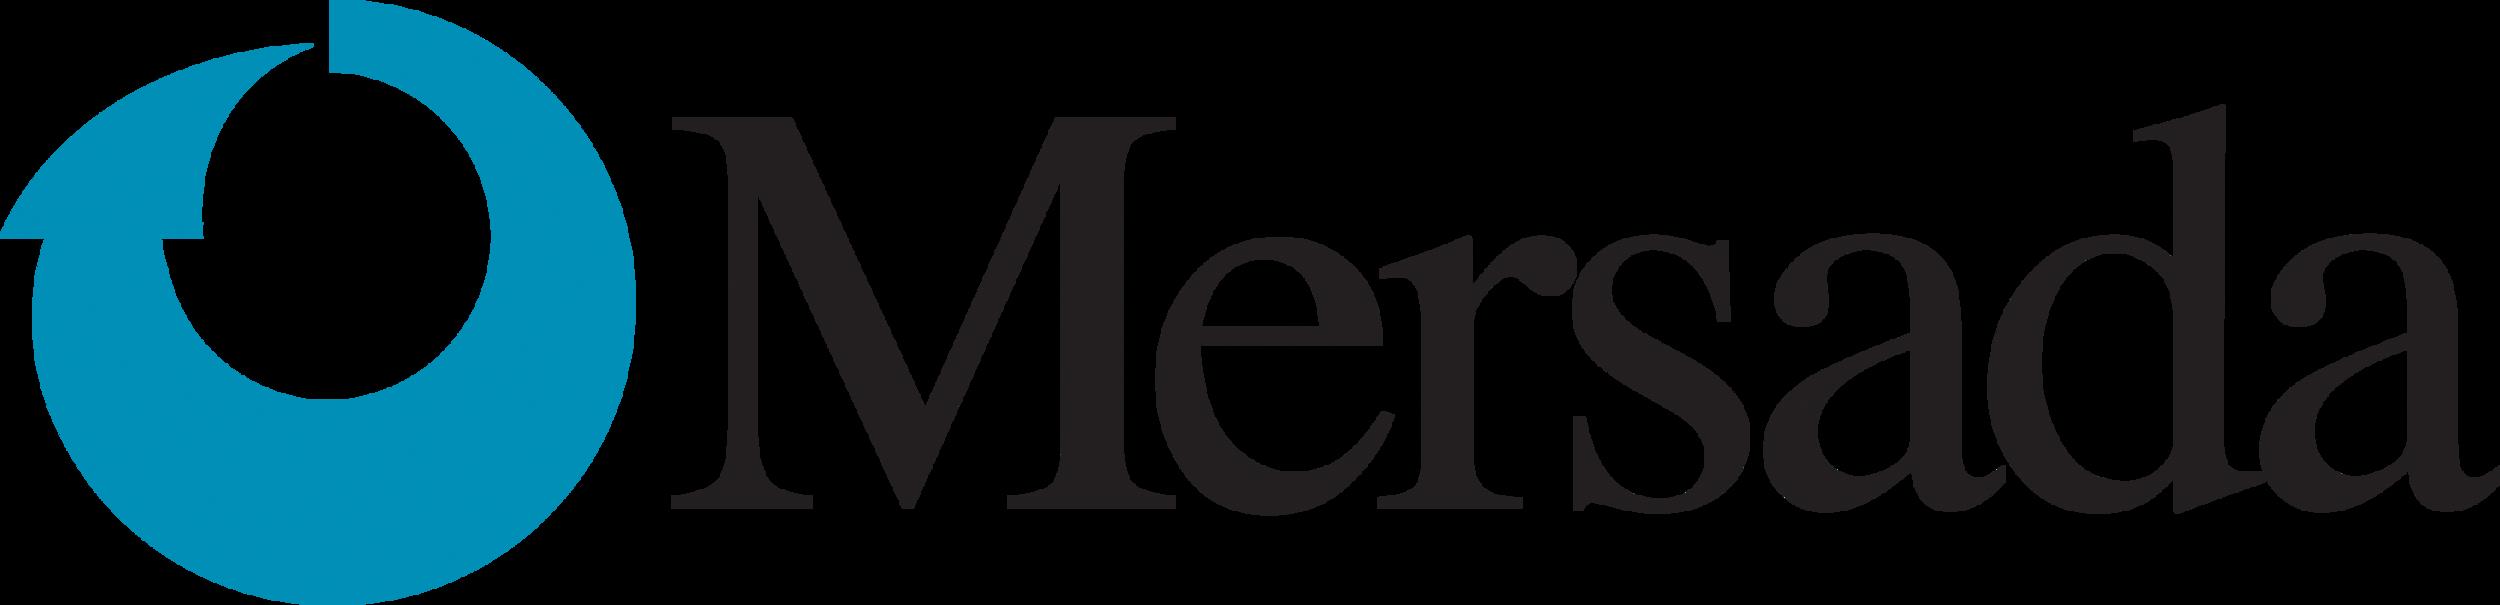 mersada_logo